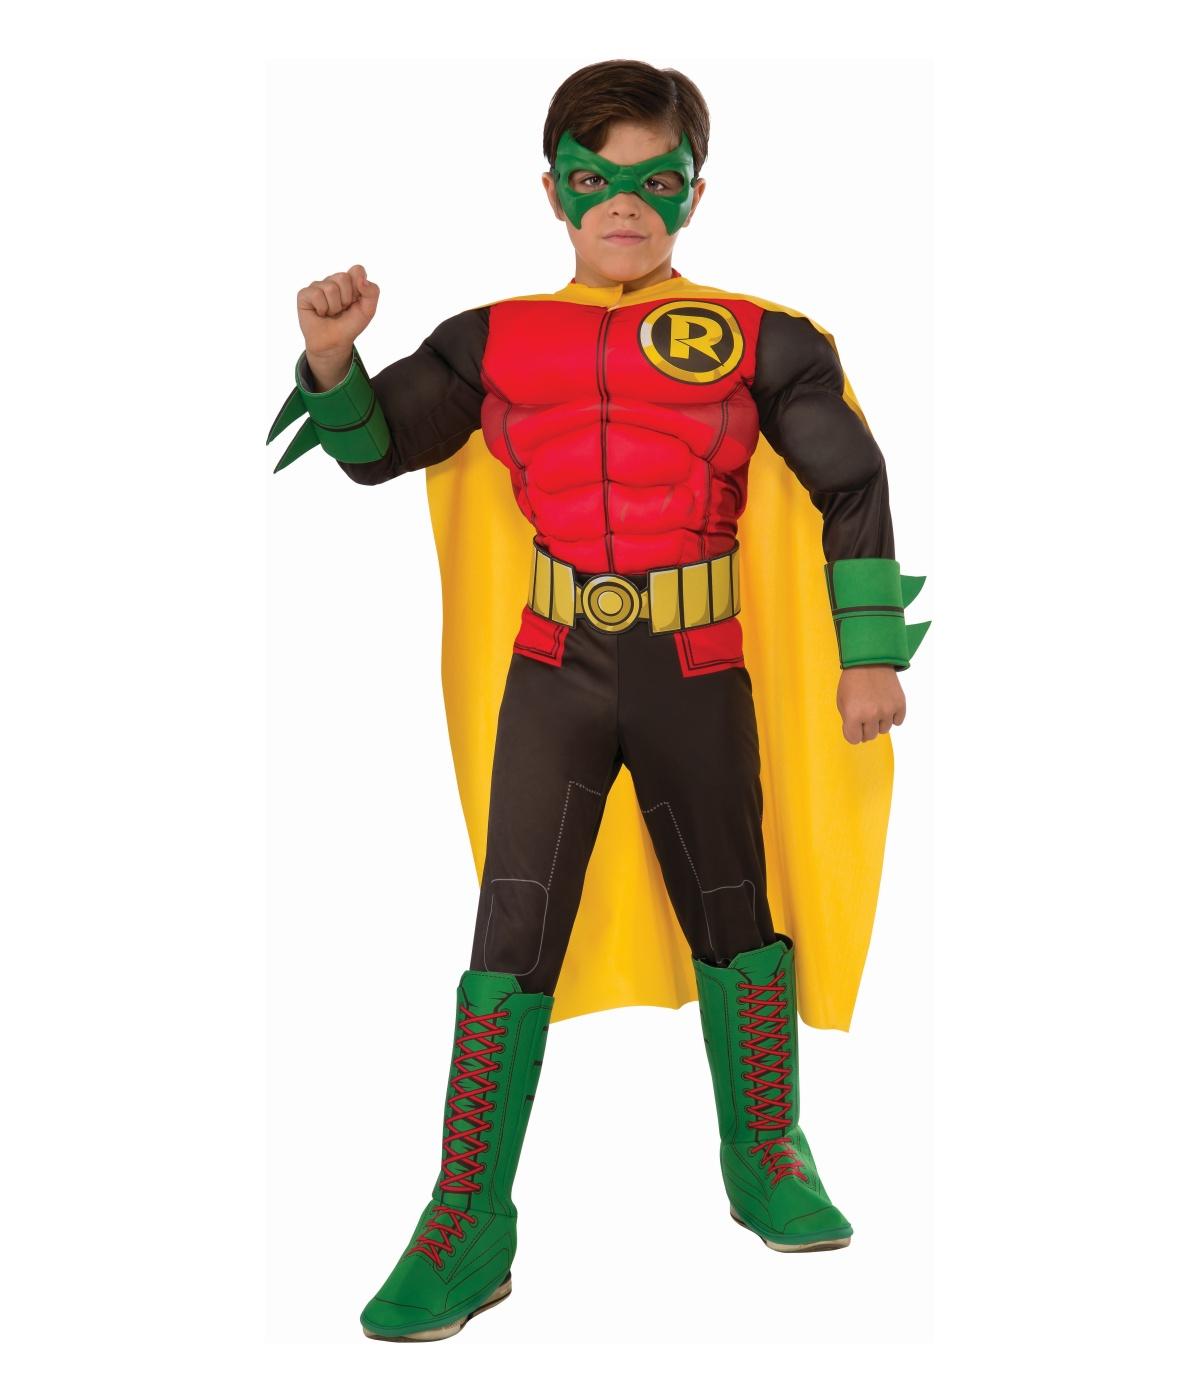 Dc Comics The New 52 Robin Muscle Boys Costume